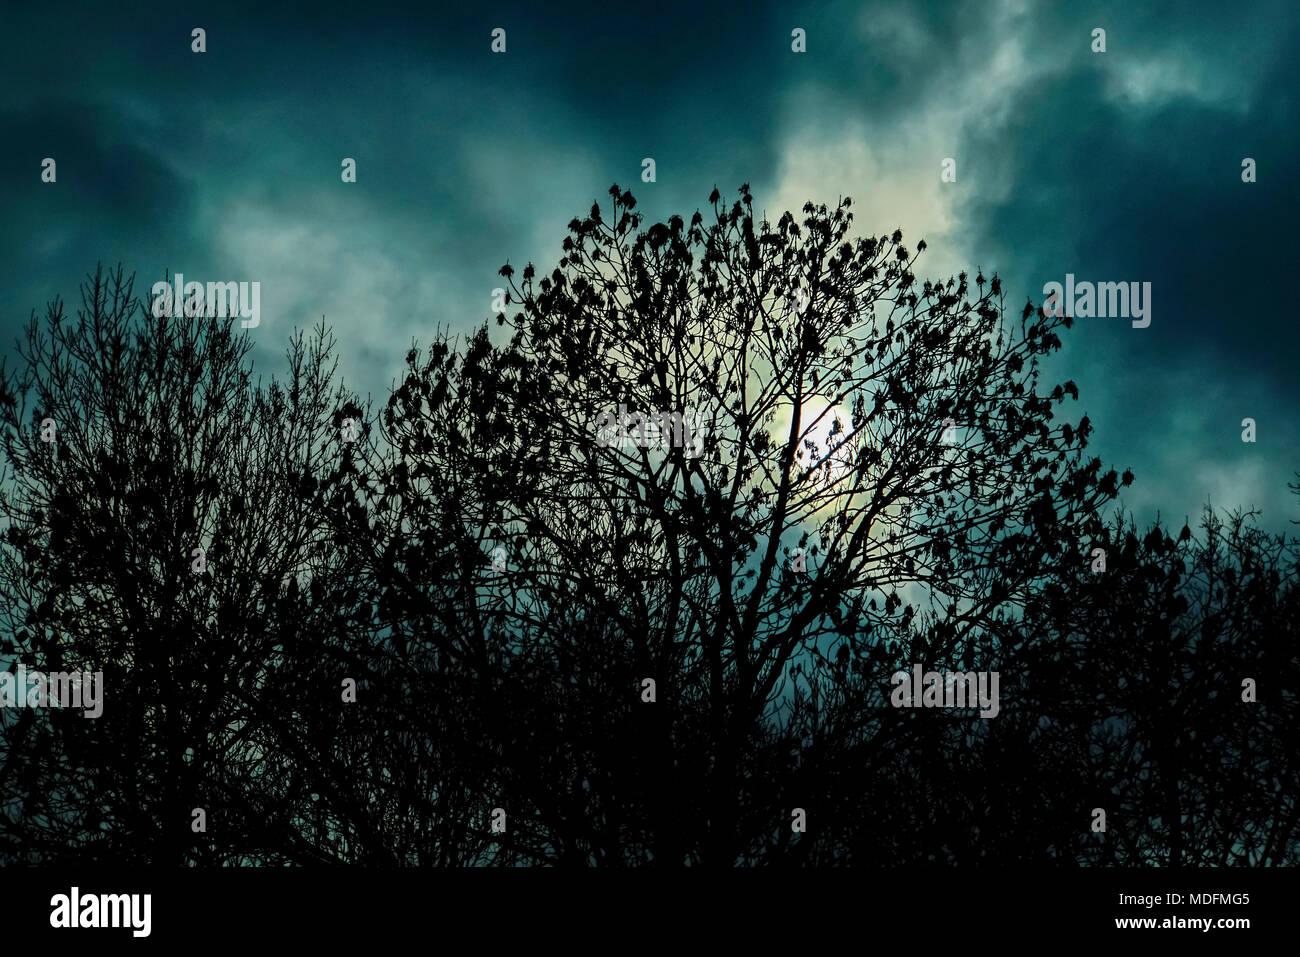 Escena del bosque de pesadilla Imagen De Stock